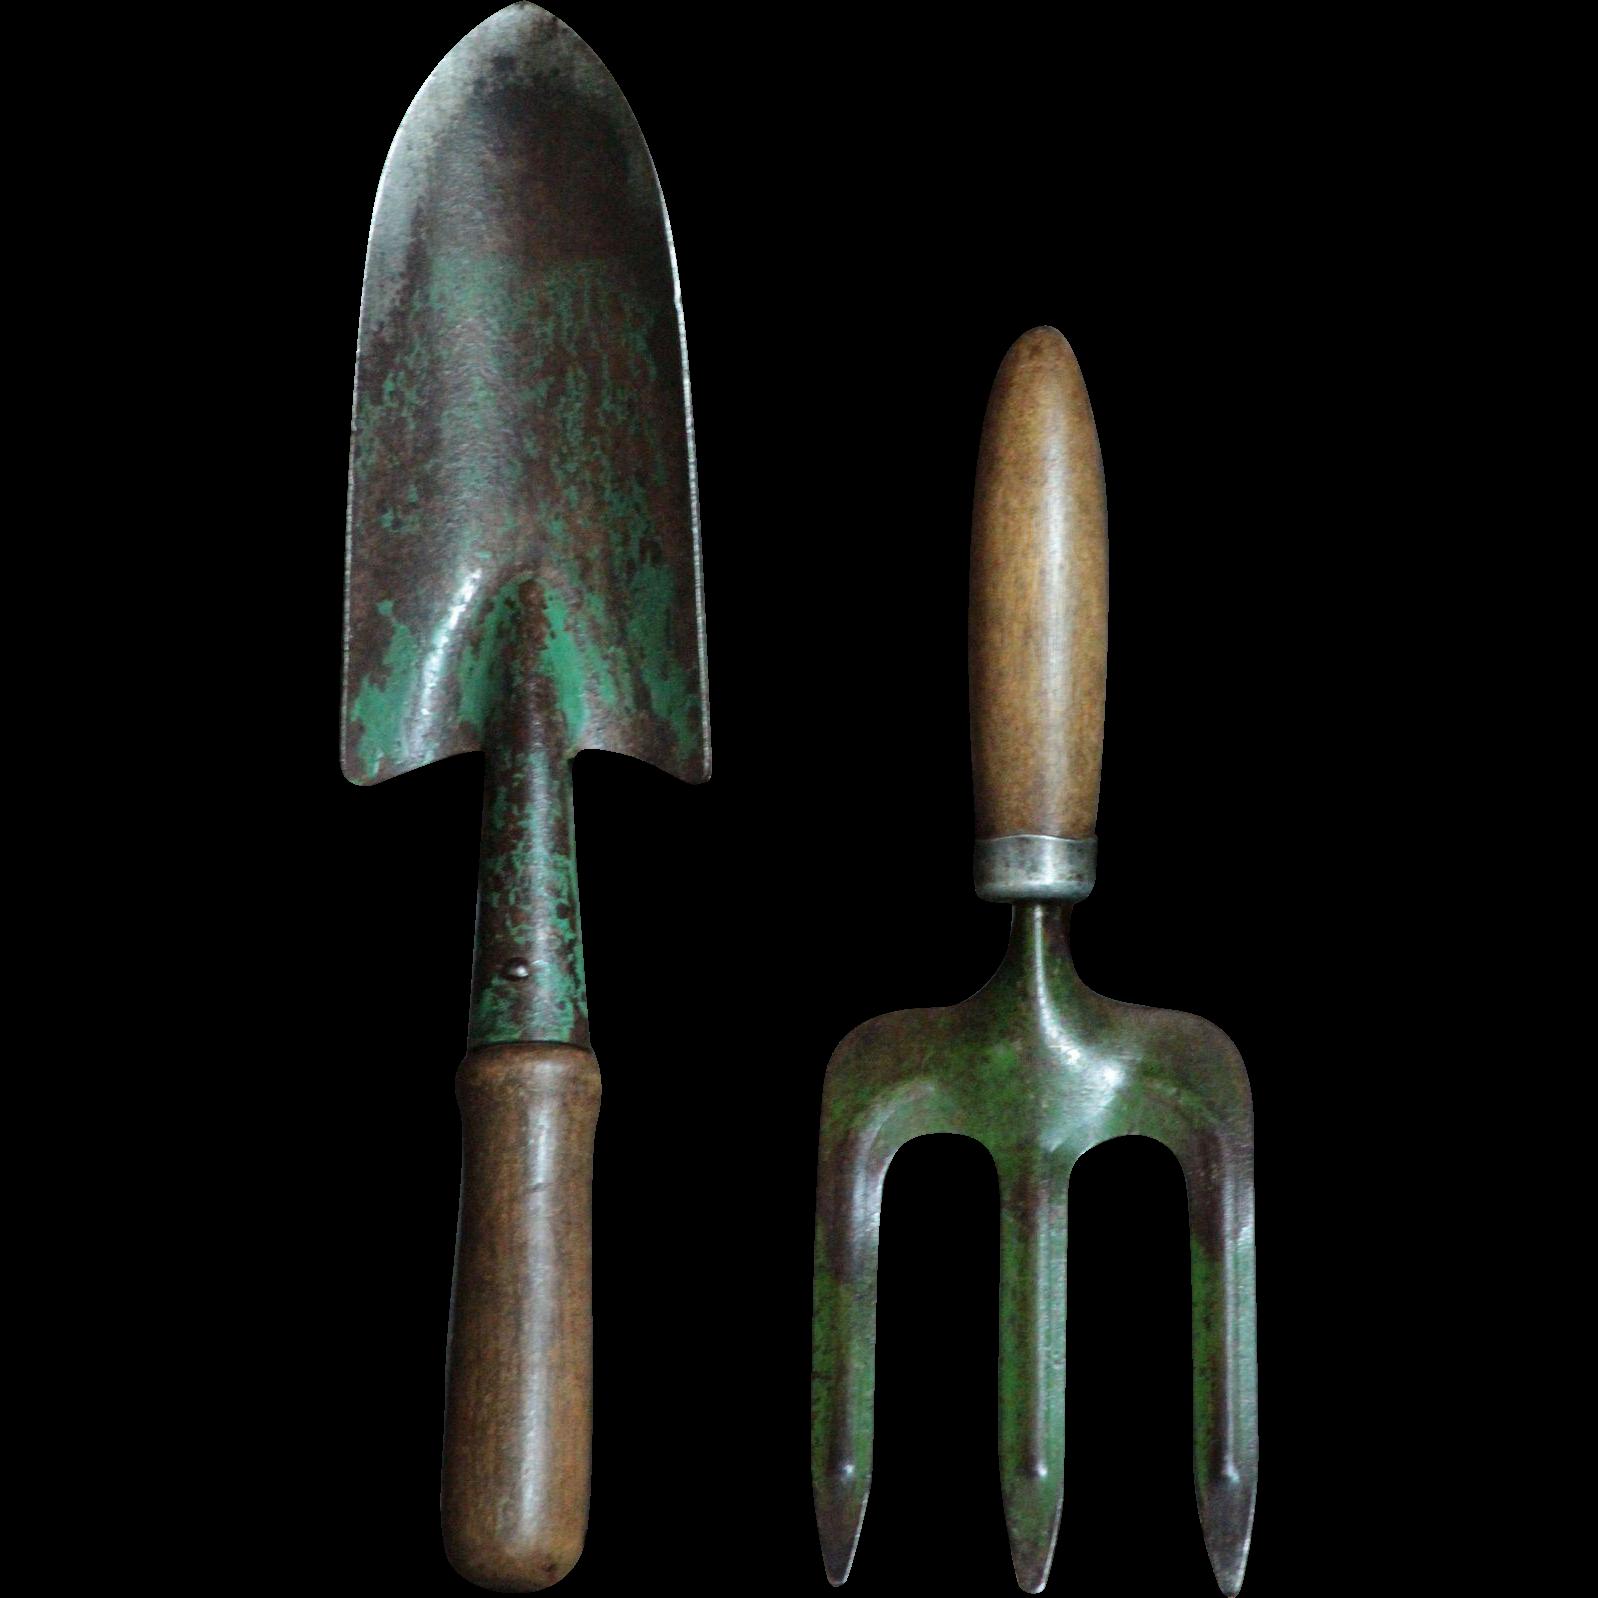 Vintage Tool Green Paint